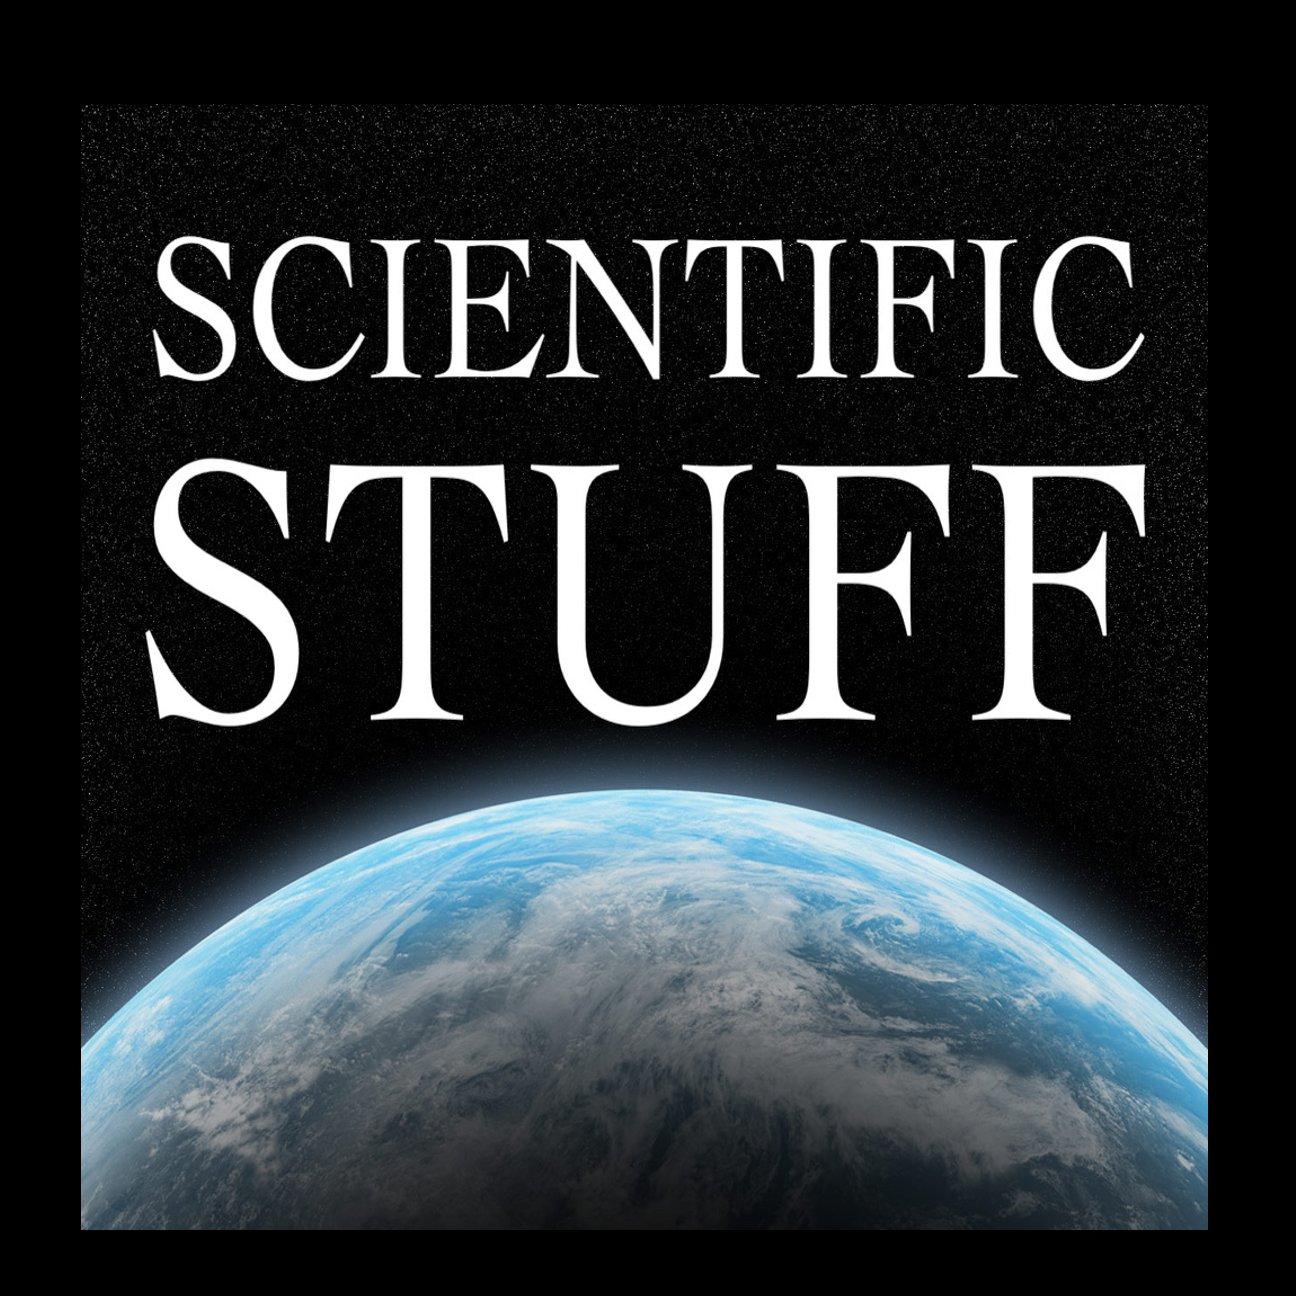 Scientific Stuff On Twitter Science News Roombas New Robotic Roomba External Serial Port Diagram